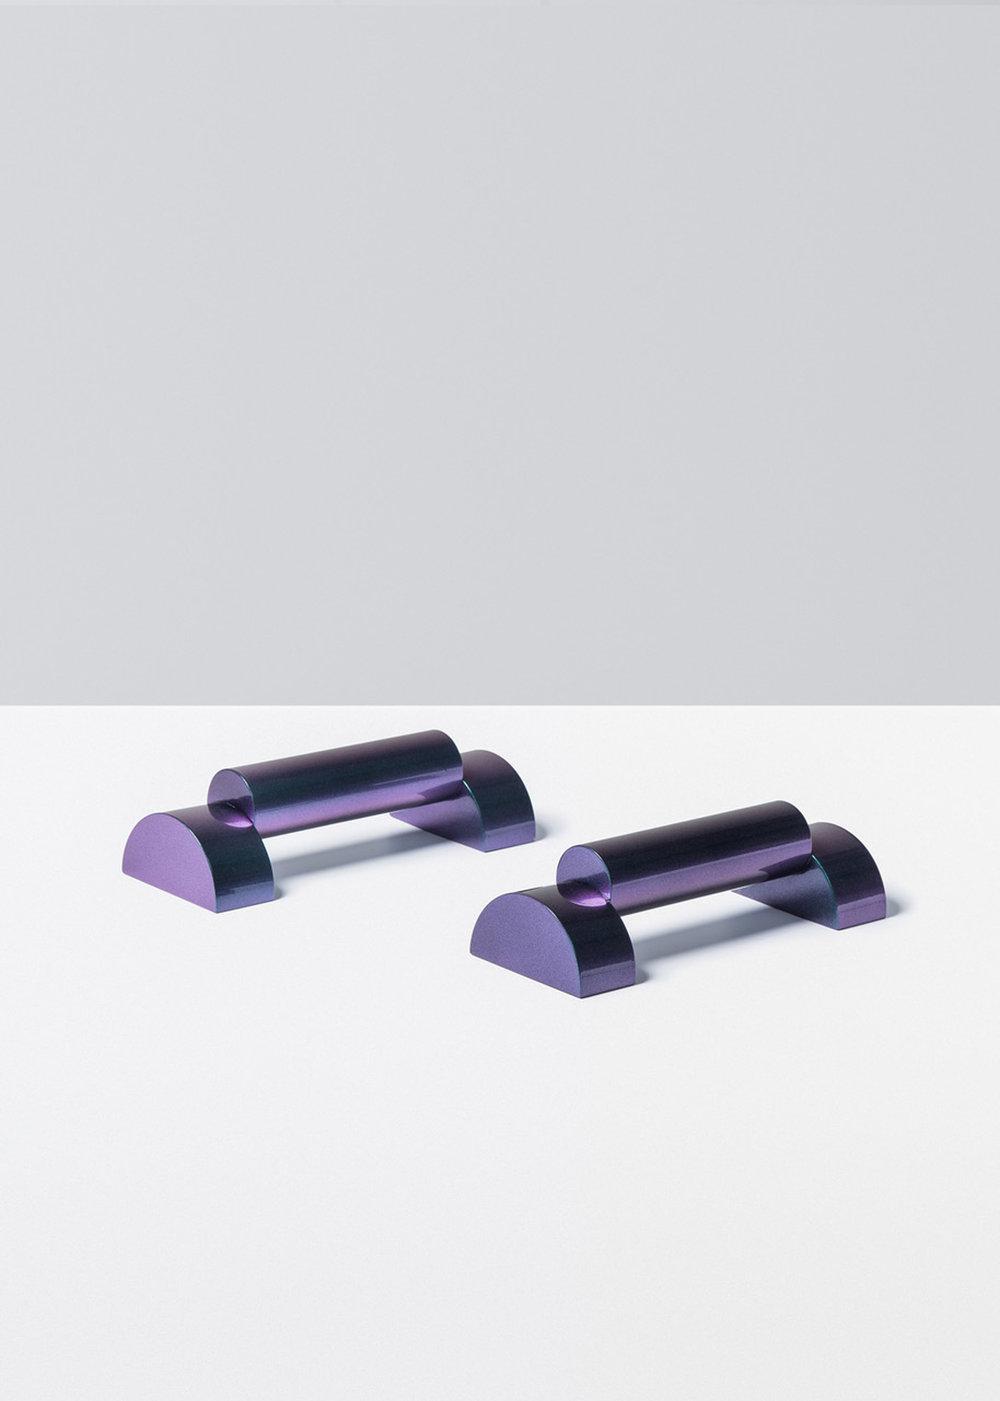 olympia-candice-joyce-blanc-ulysse-martel-free-weights-design_dezainaa_4